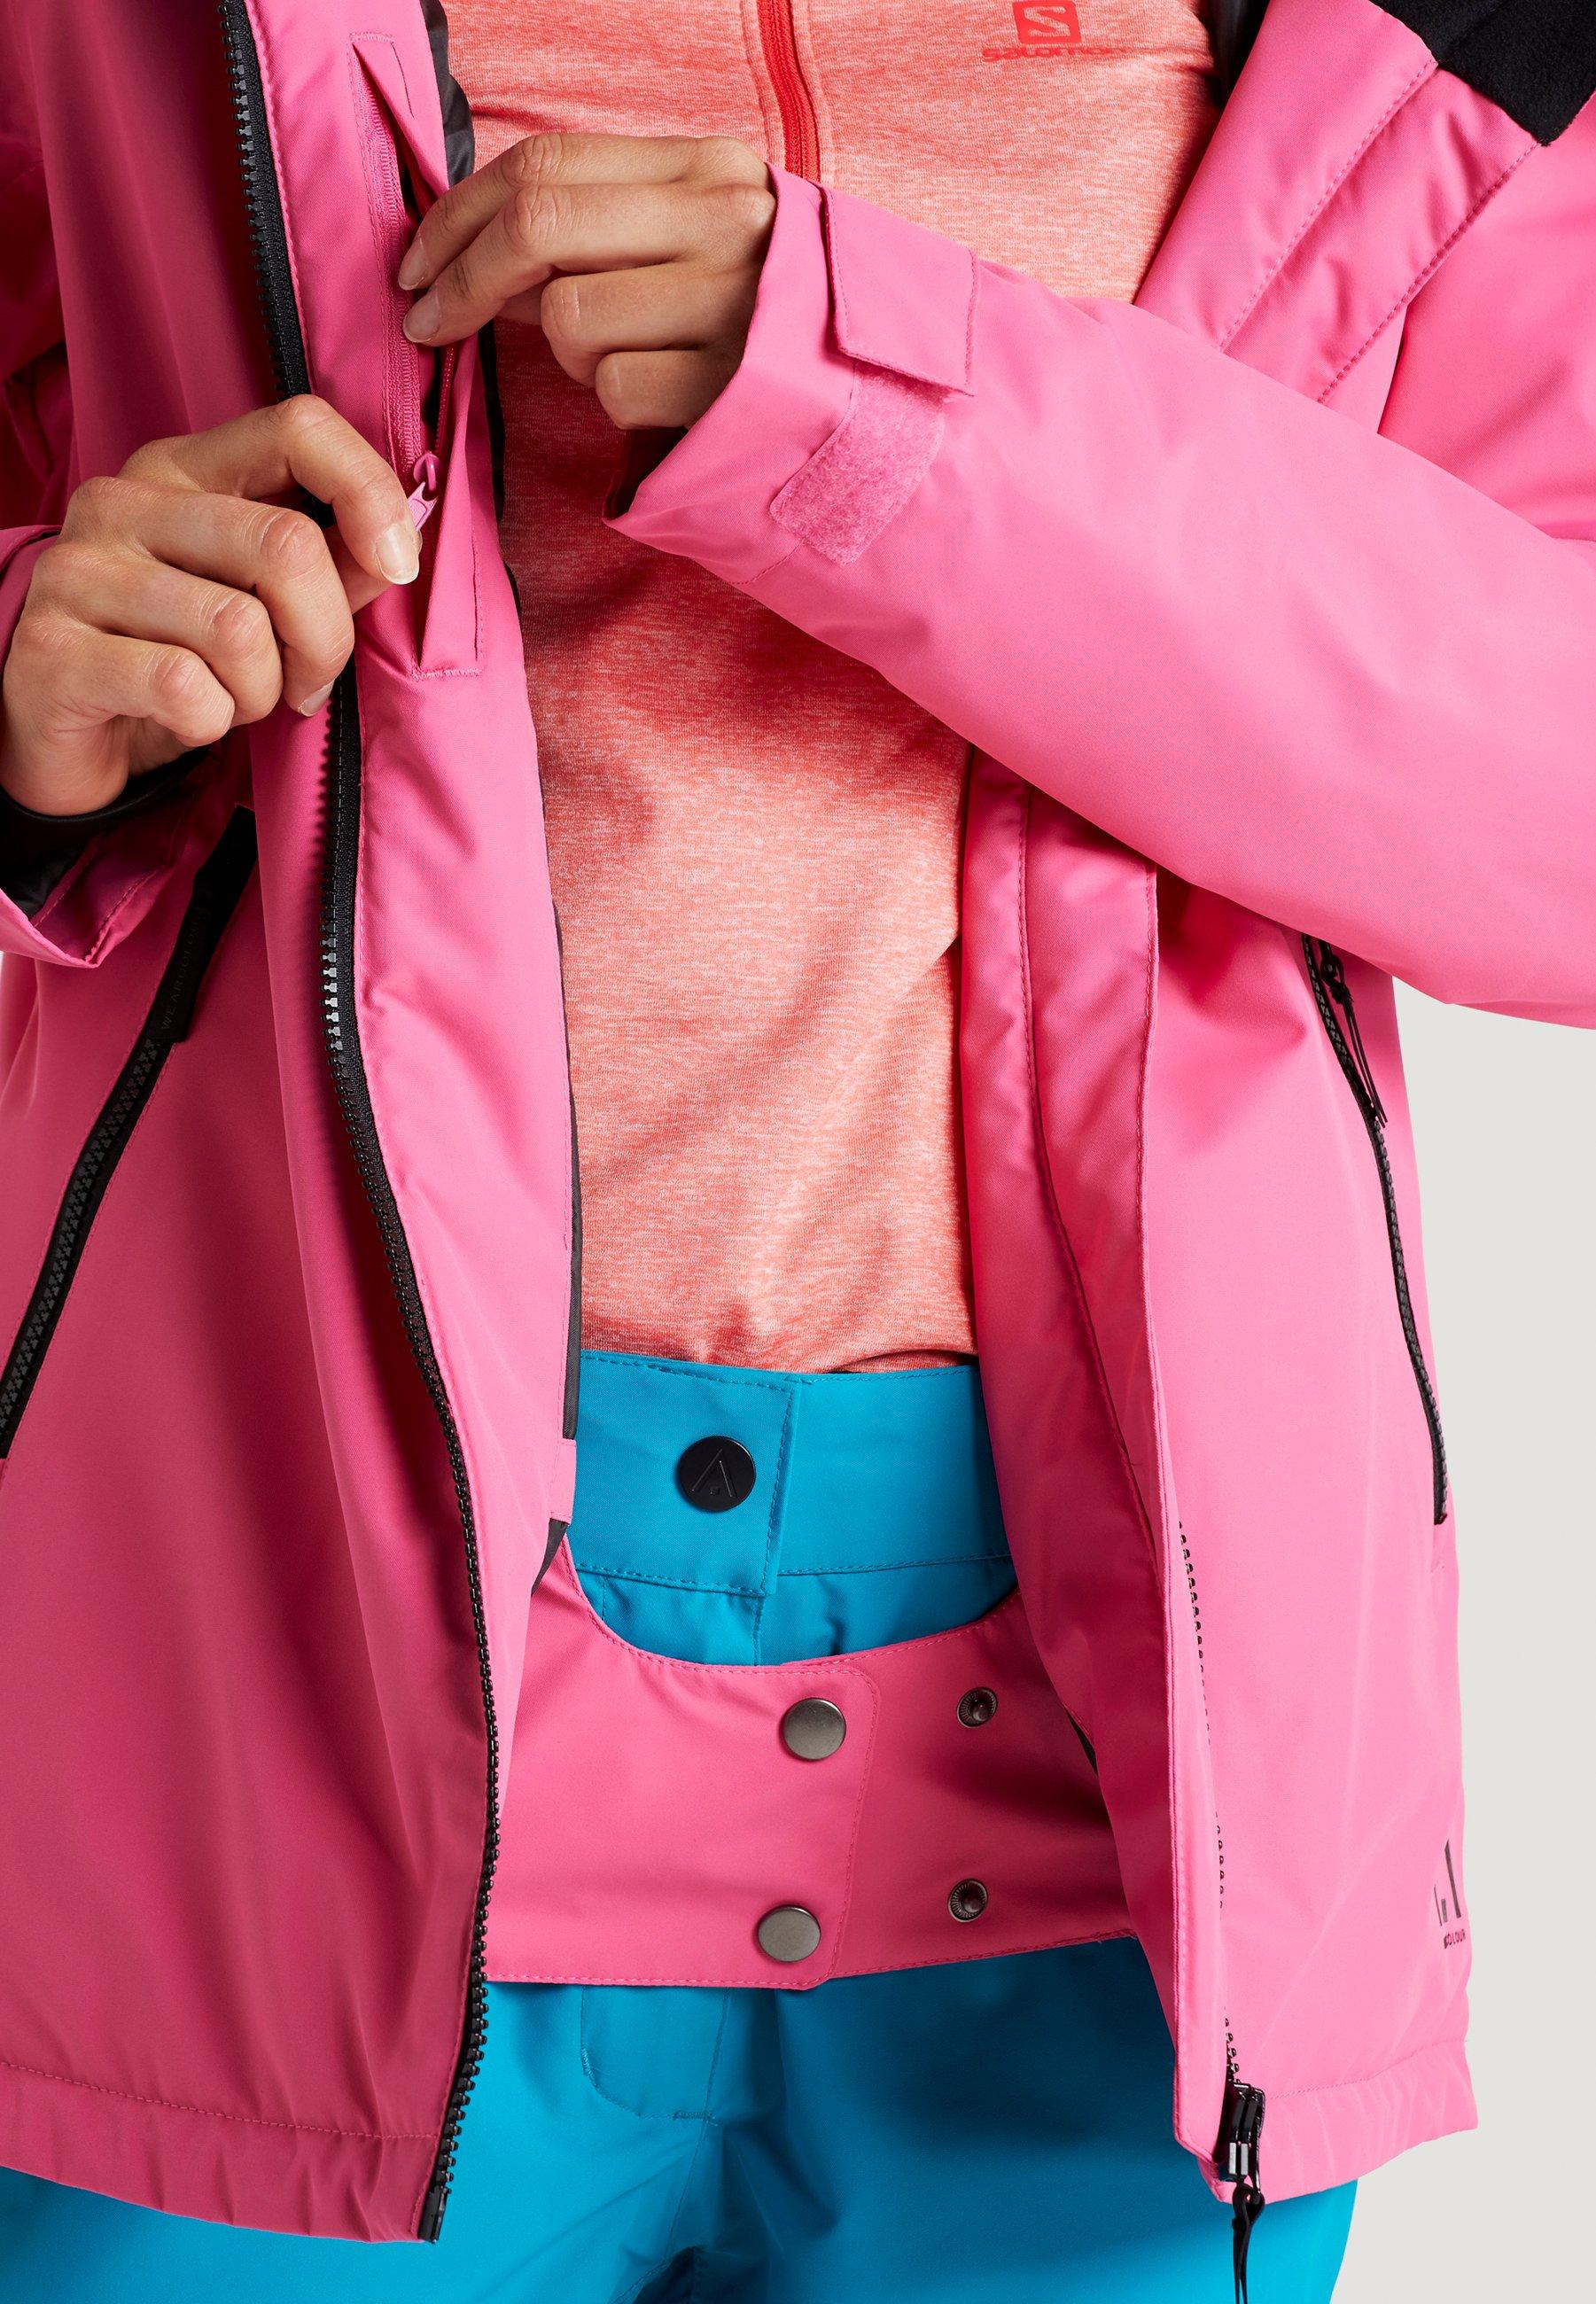 JacketGiacca Cake Wearcolour Da Post Pink It Snowboard txrsChQd